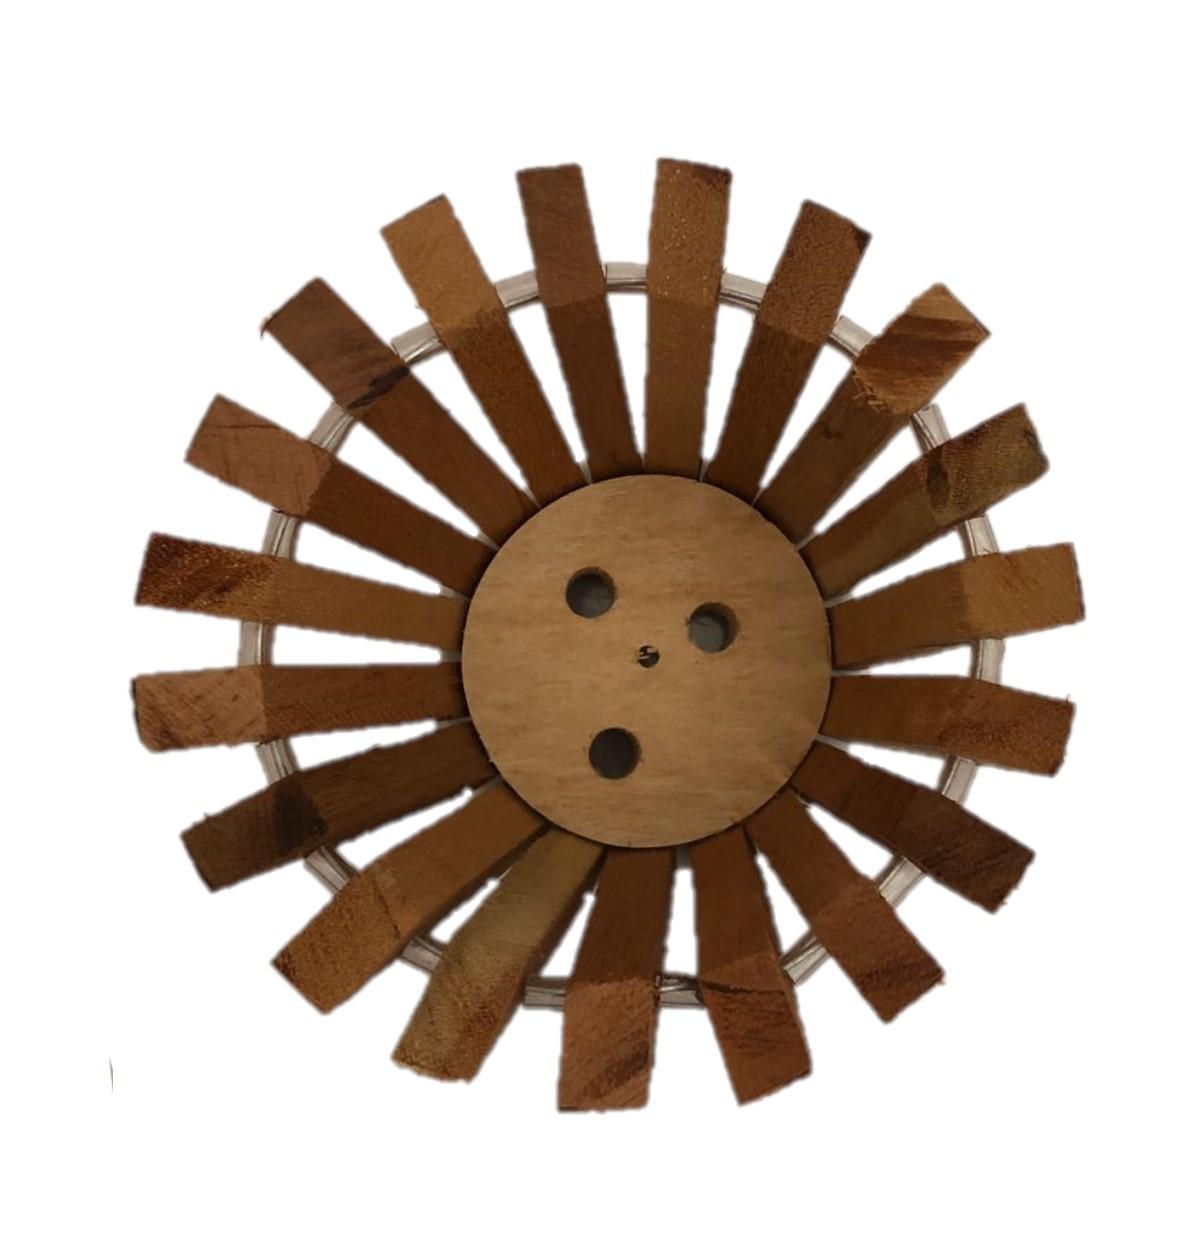 Cachepot de madeira para mesa